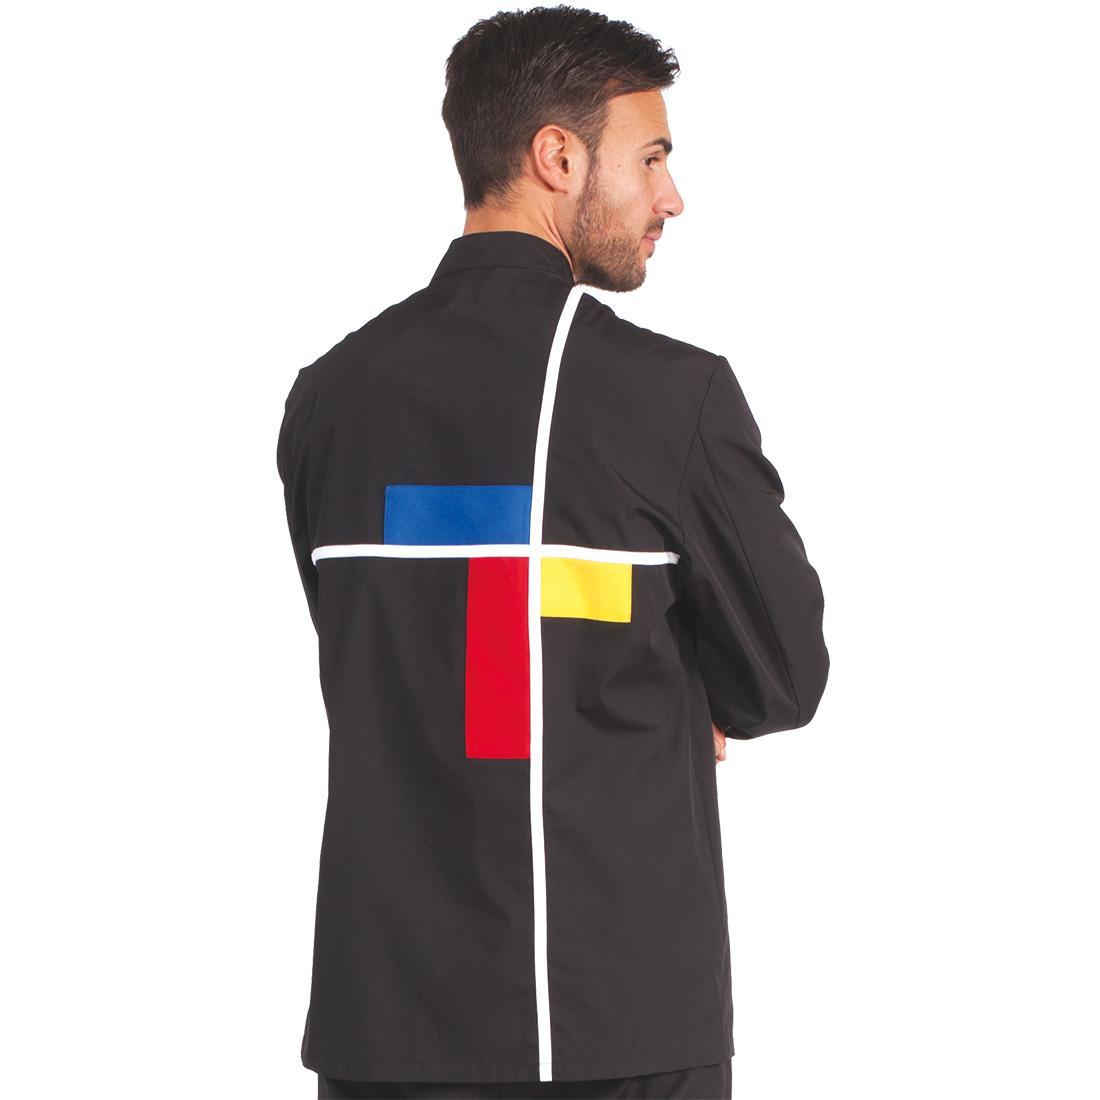 mondrian-giacca-cuoco-nera